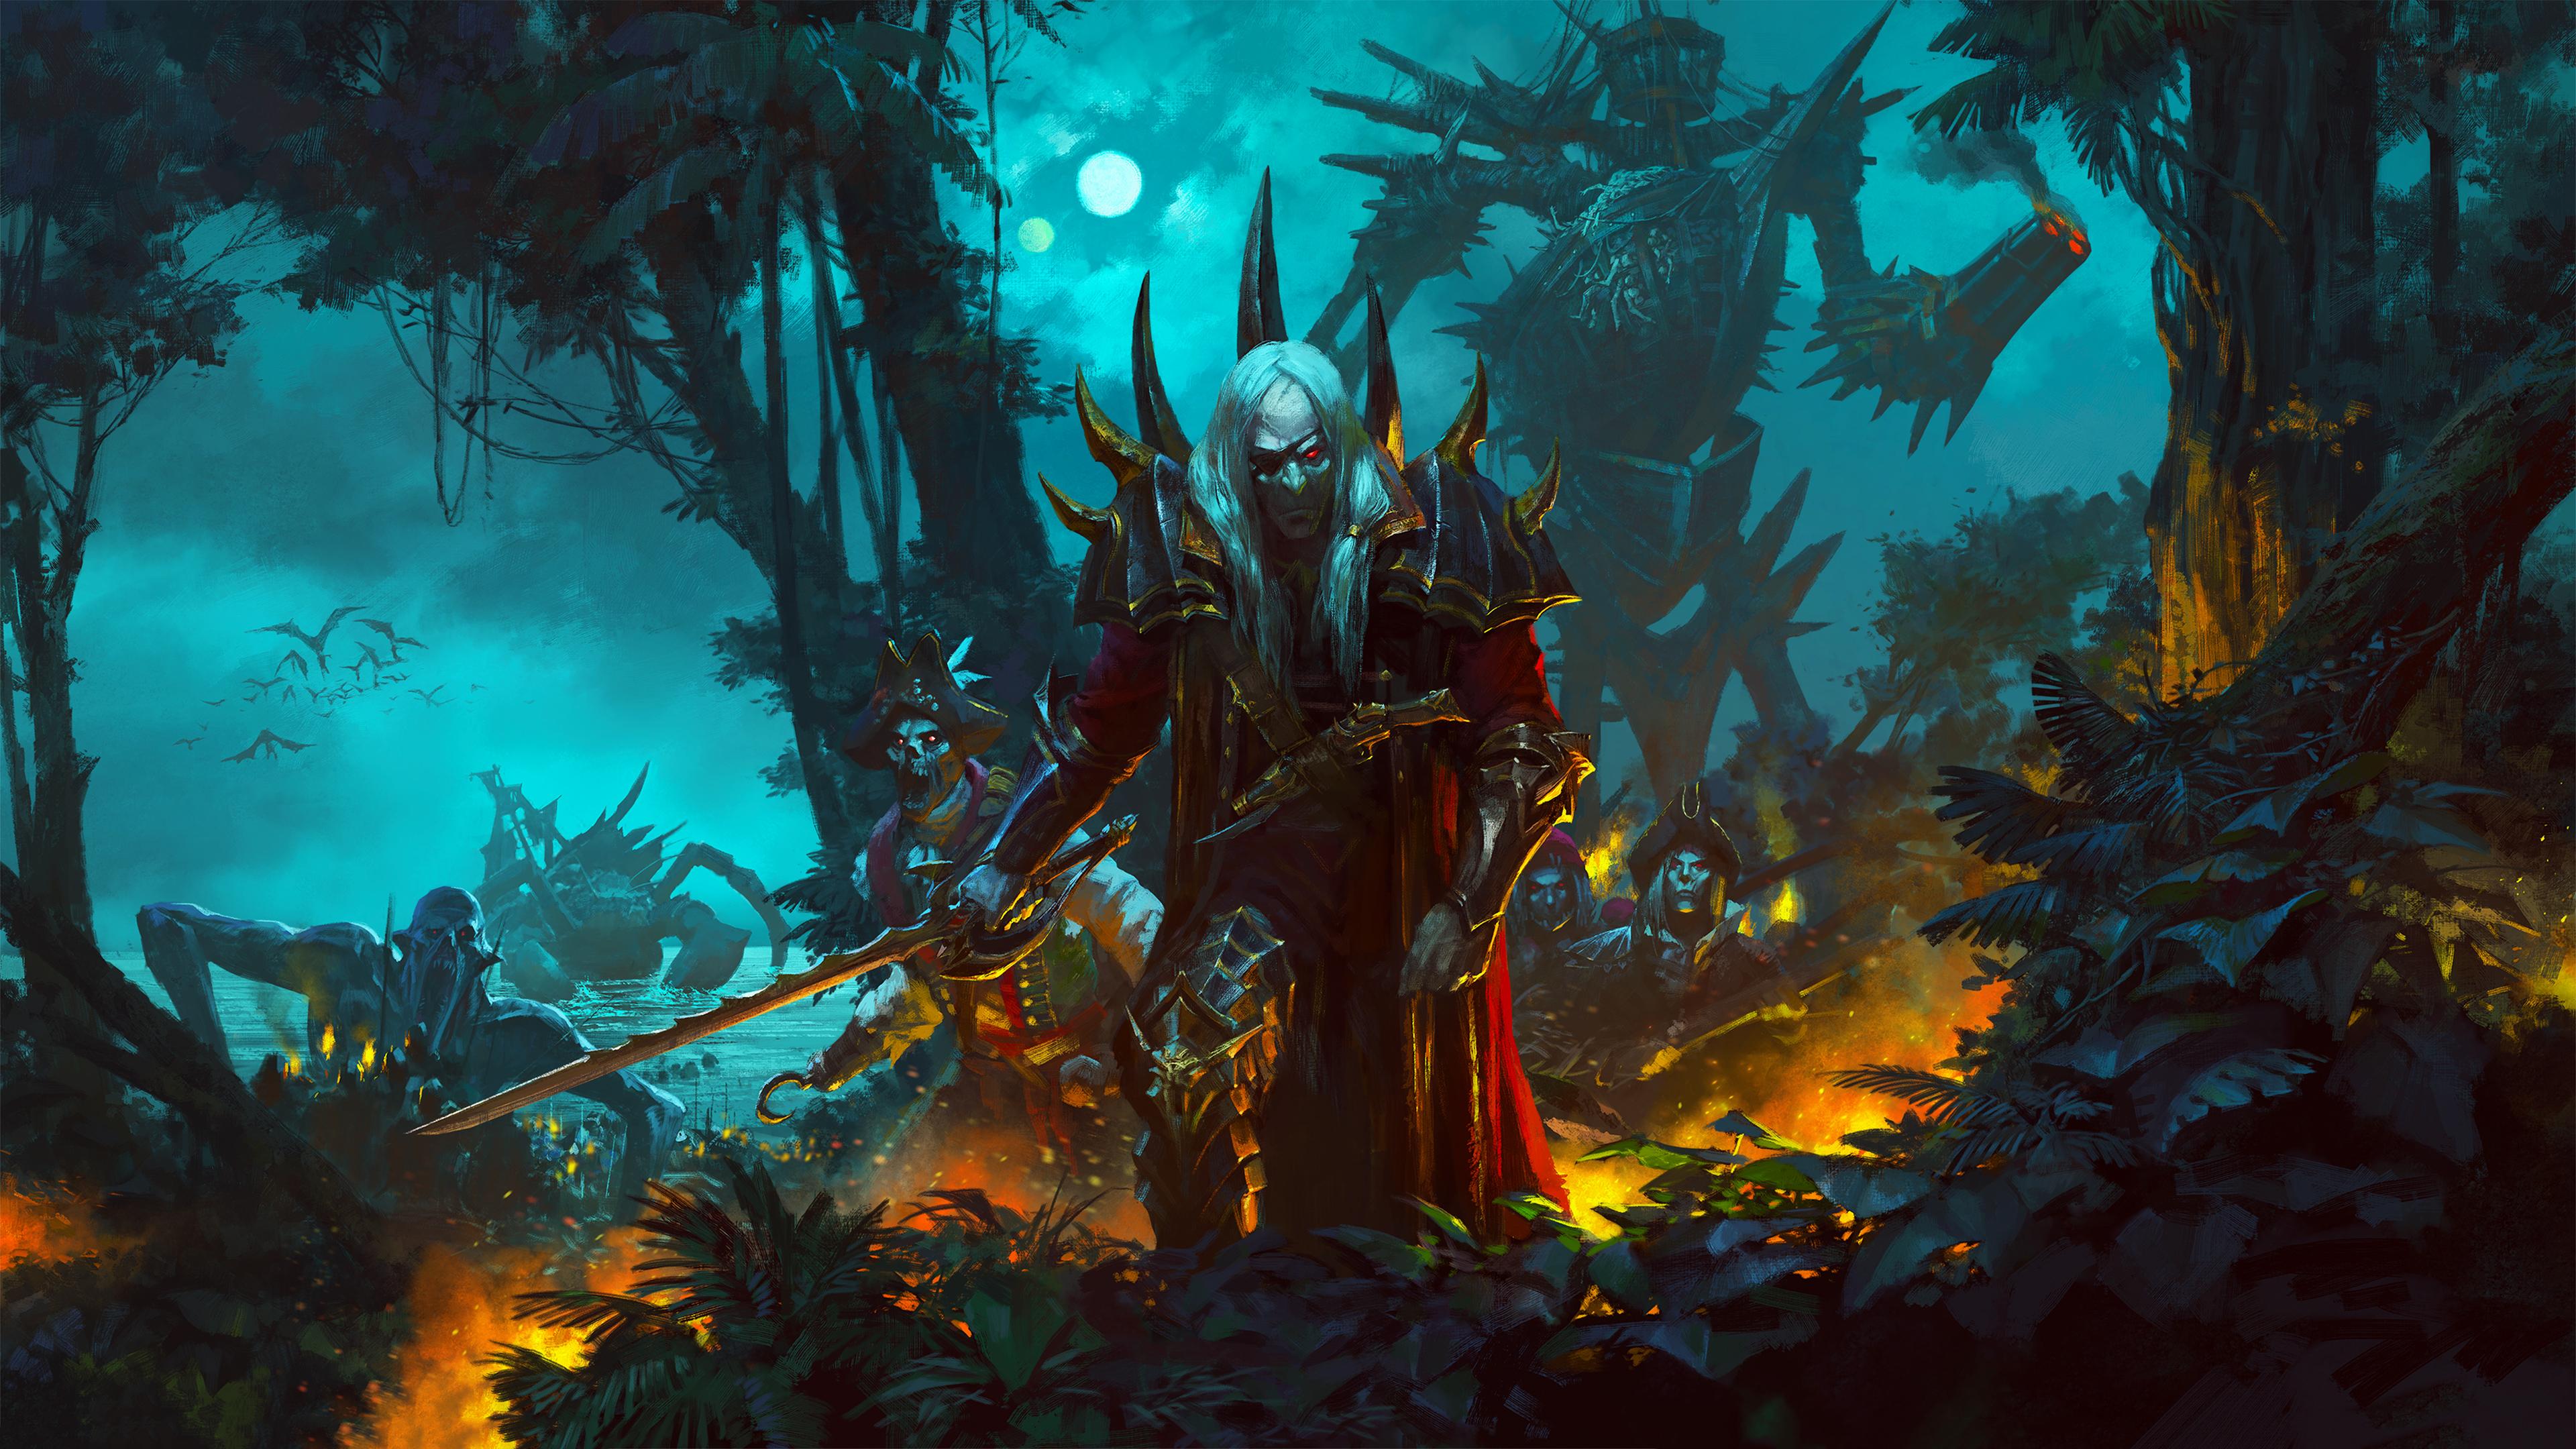 total war warhammer 2 4k 1539979139 - Total War Warhammer 2 4k - total war warhammer wallpapers, total war warhammer 2 wallpapers, pc games wallpapers, hd-wallpapers, games wallpapers, 4k-wallpapers, 2017 games wallpapers